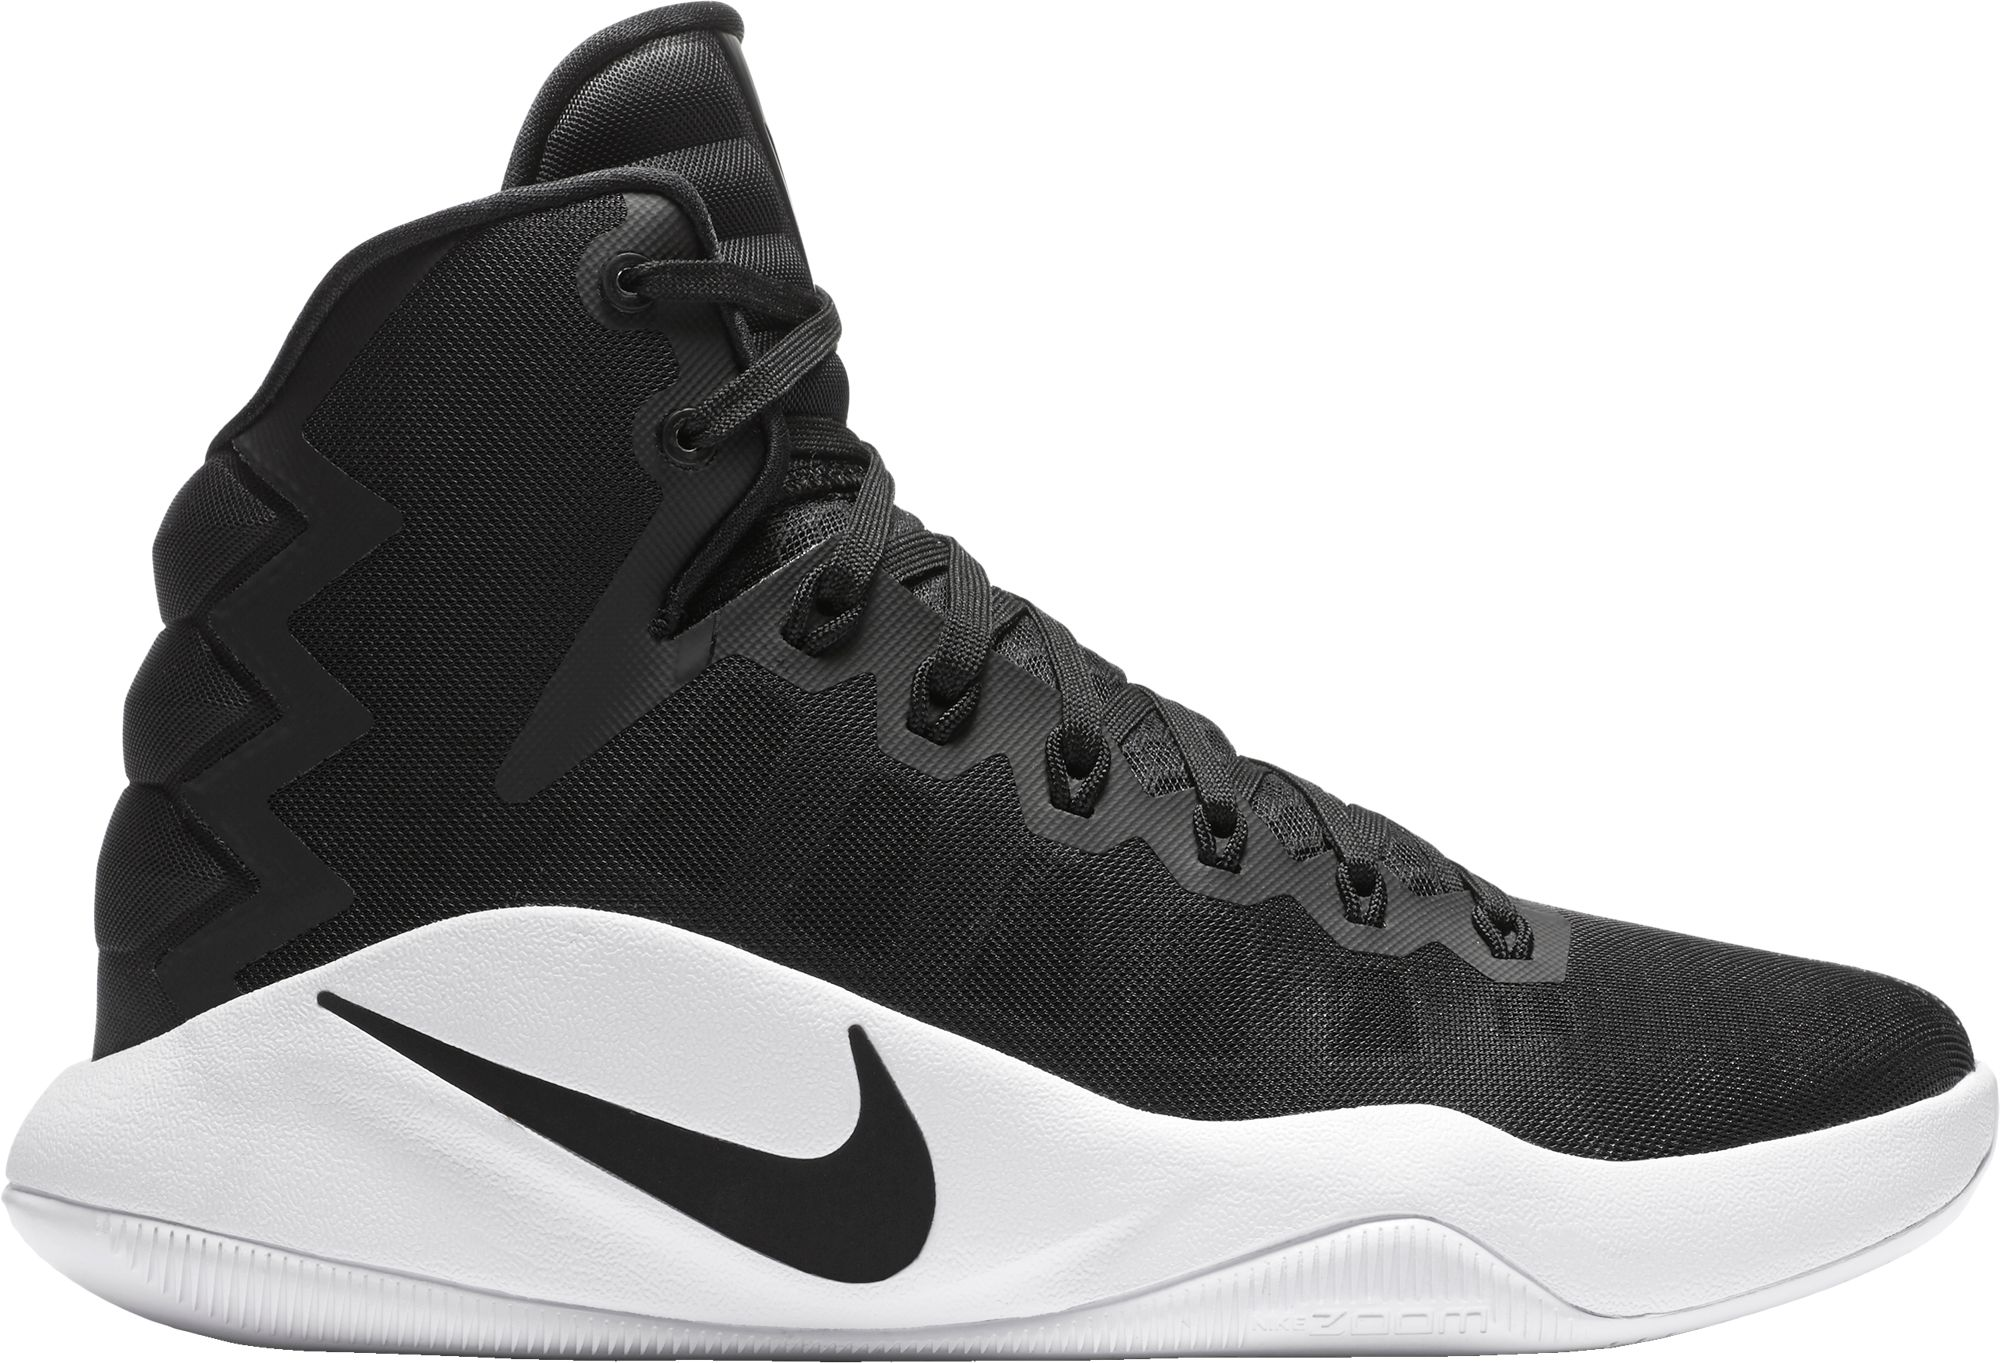 Blue Nike High Top Basketball Shoes